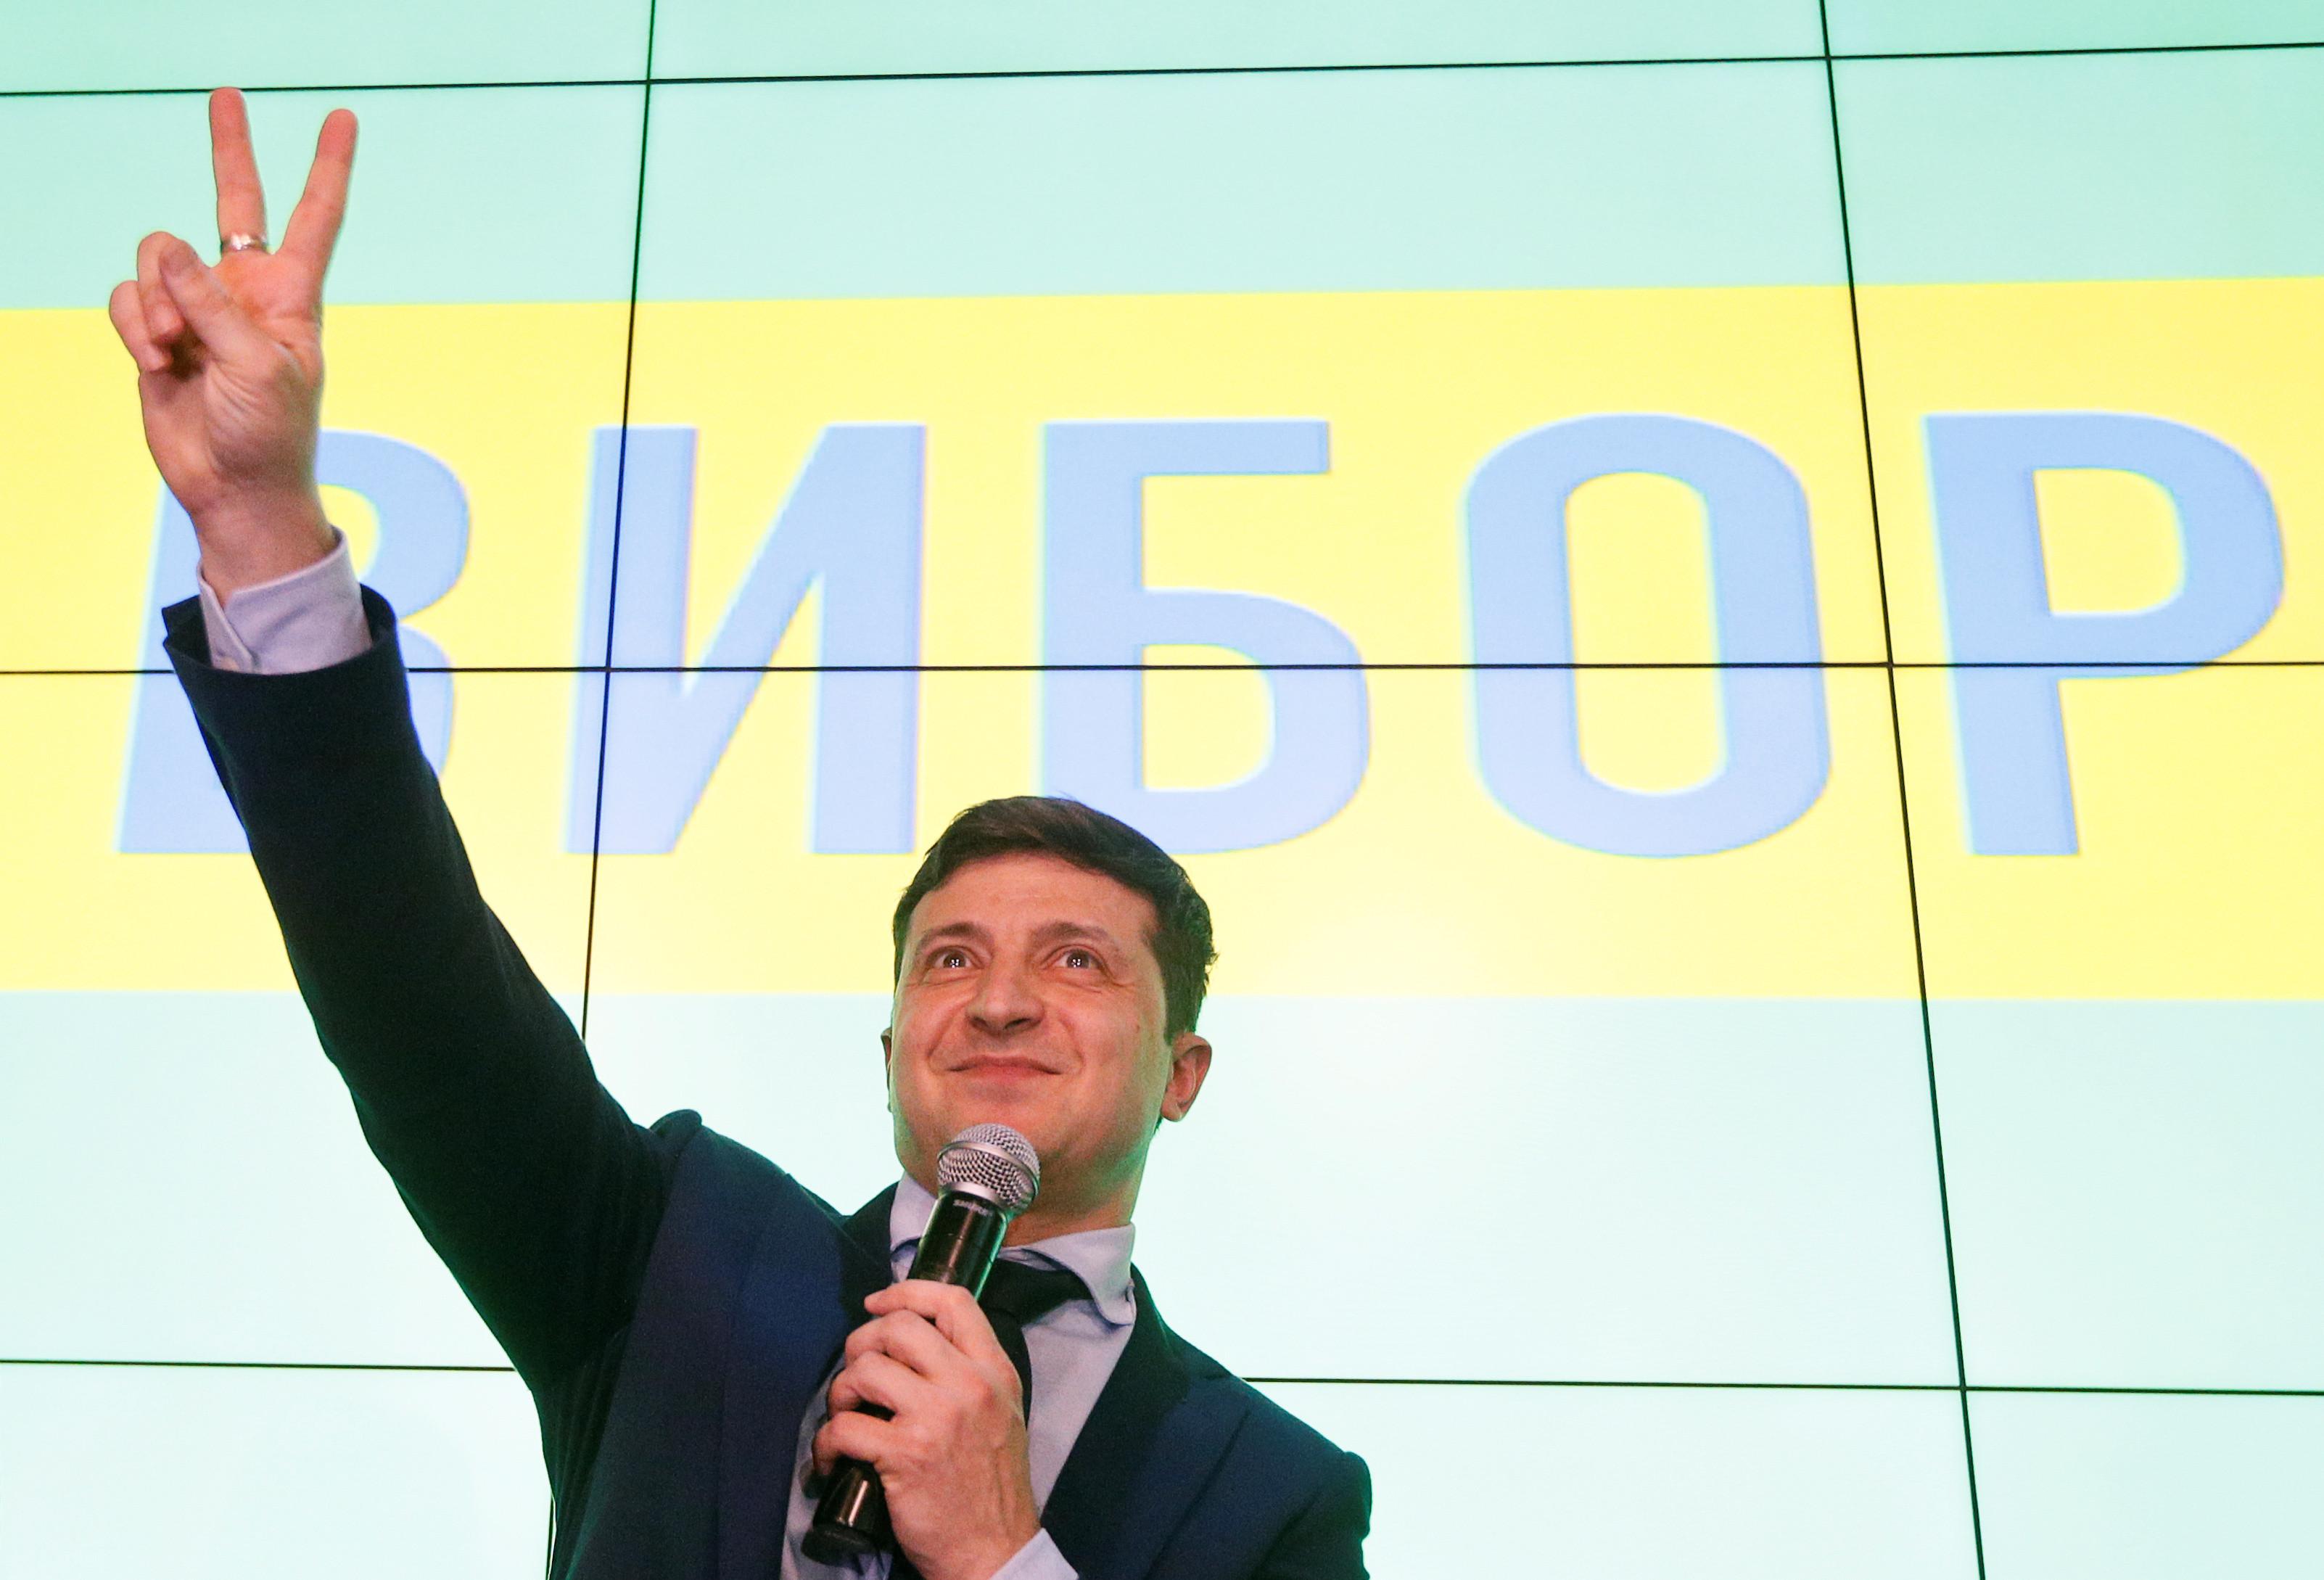 Presidente ucraniano dissolve Parlamento durante investidura